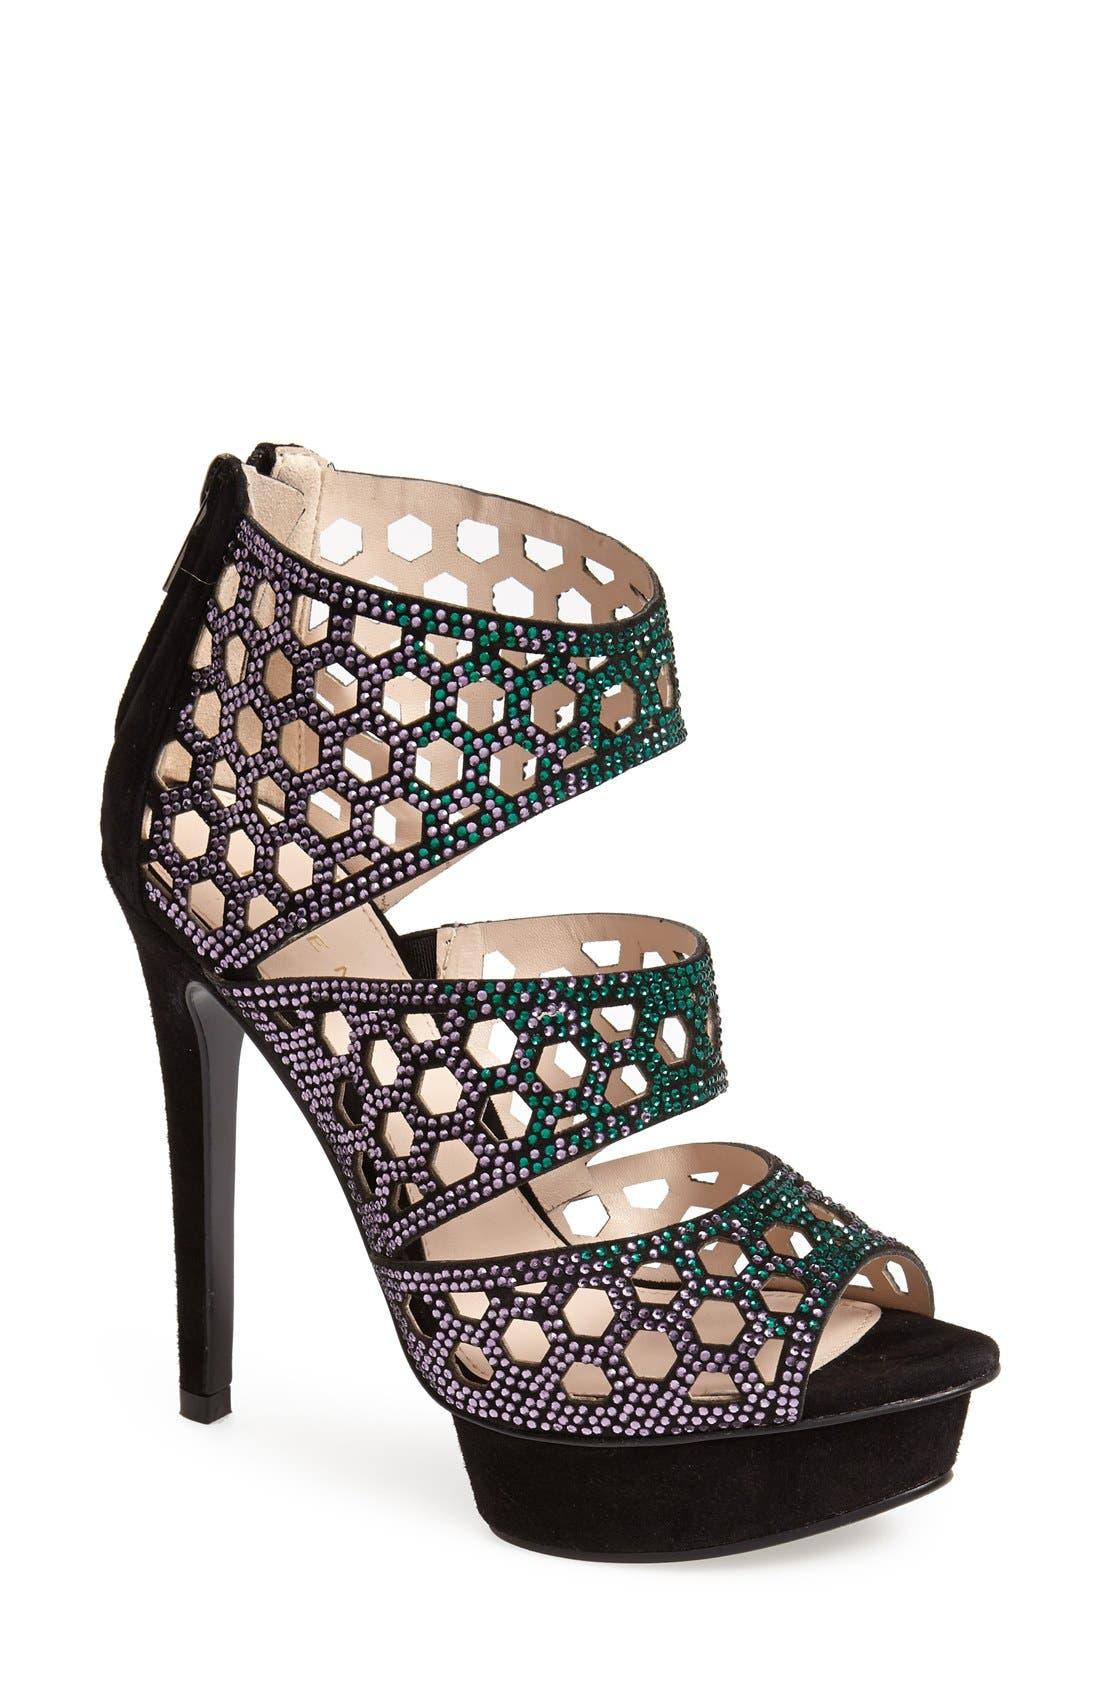 Alternate Image 1 Selected - Pelle Moda 'Mahal II' Platform Sandal (Women)